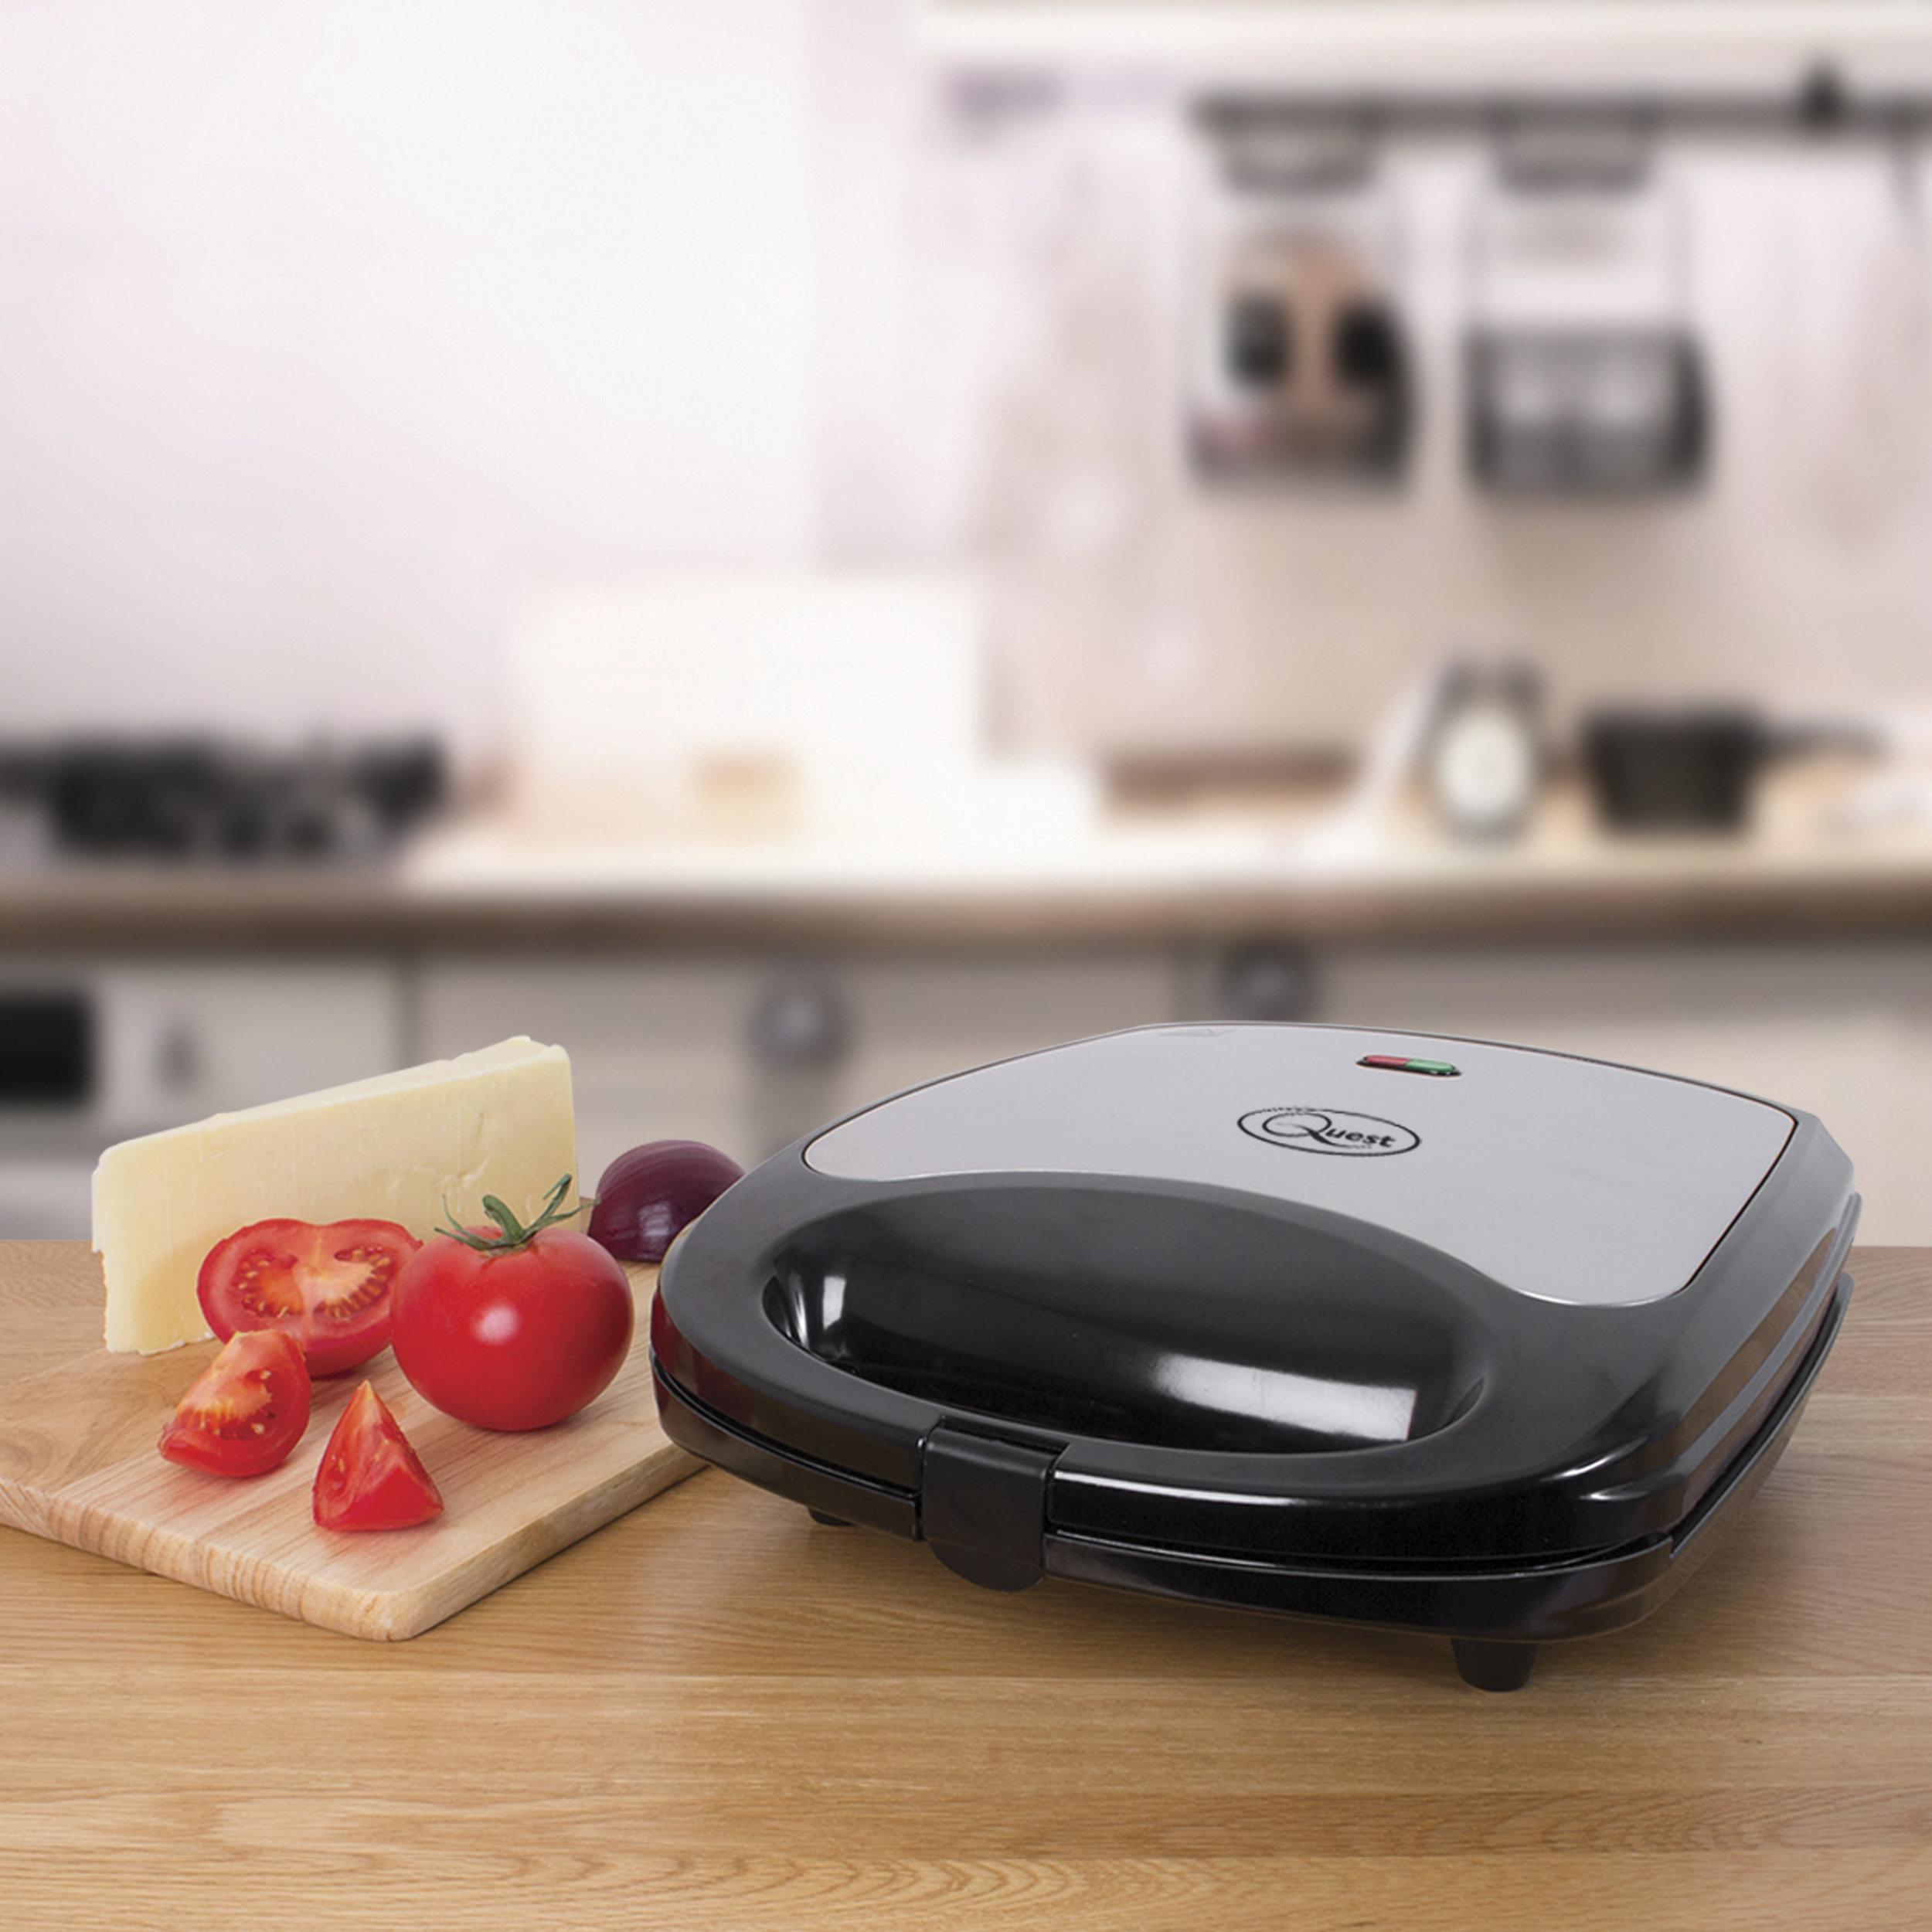 Quad Sandwich Toaster in the kitchen